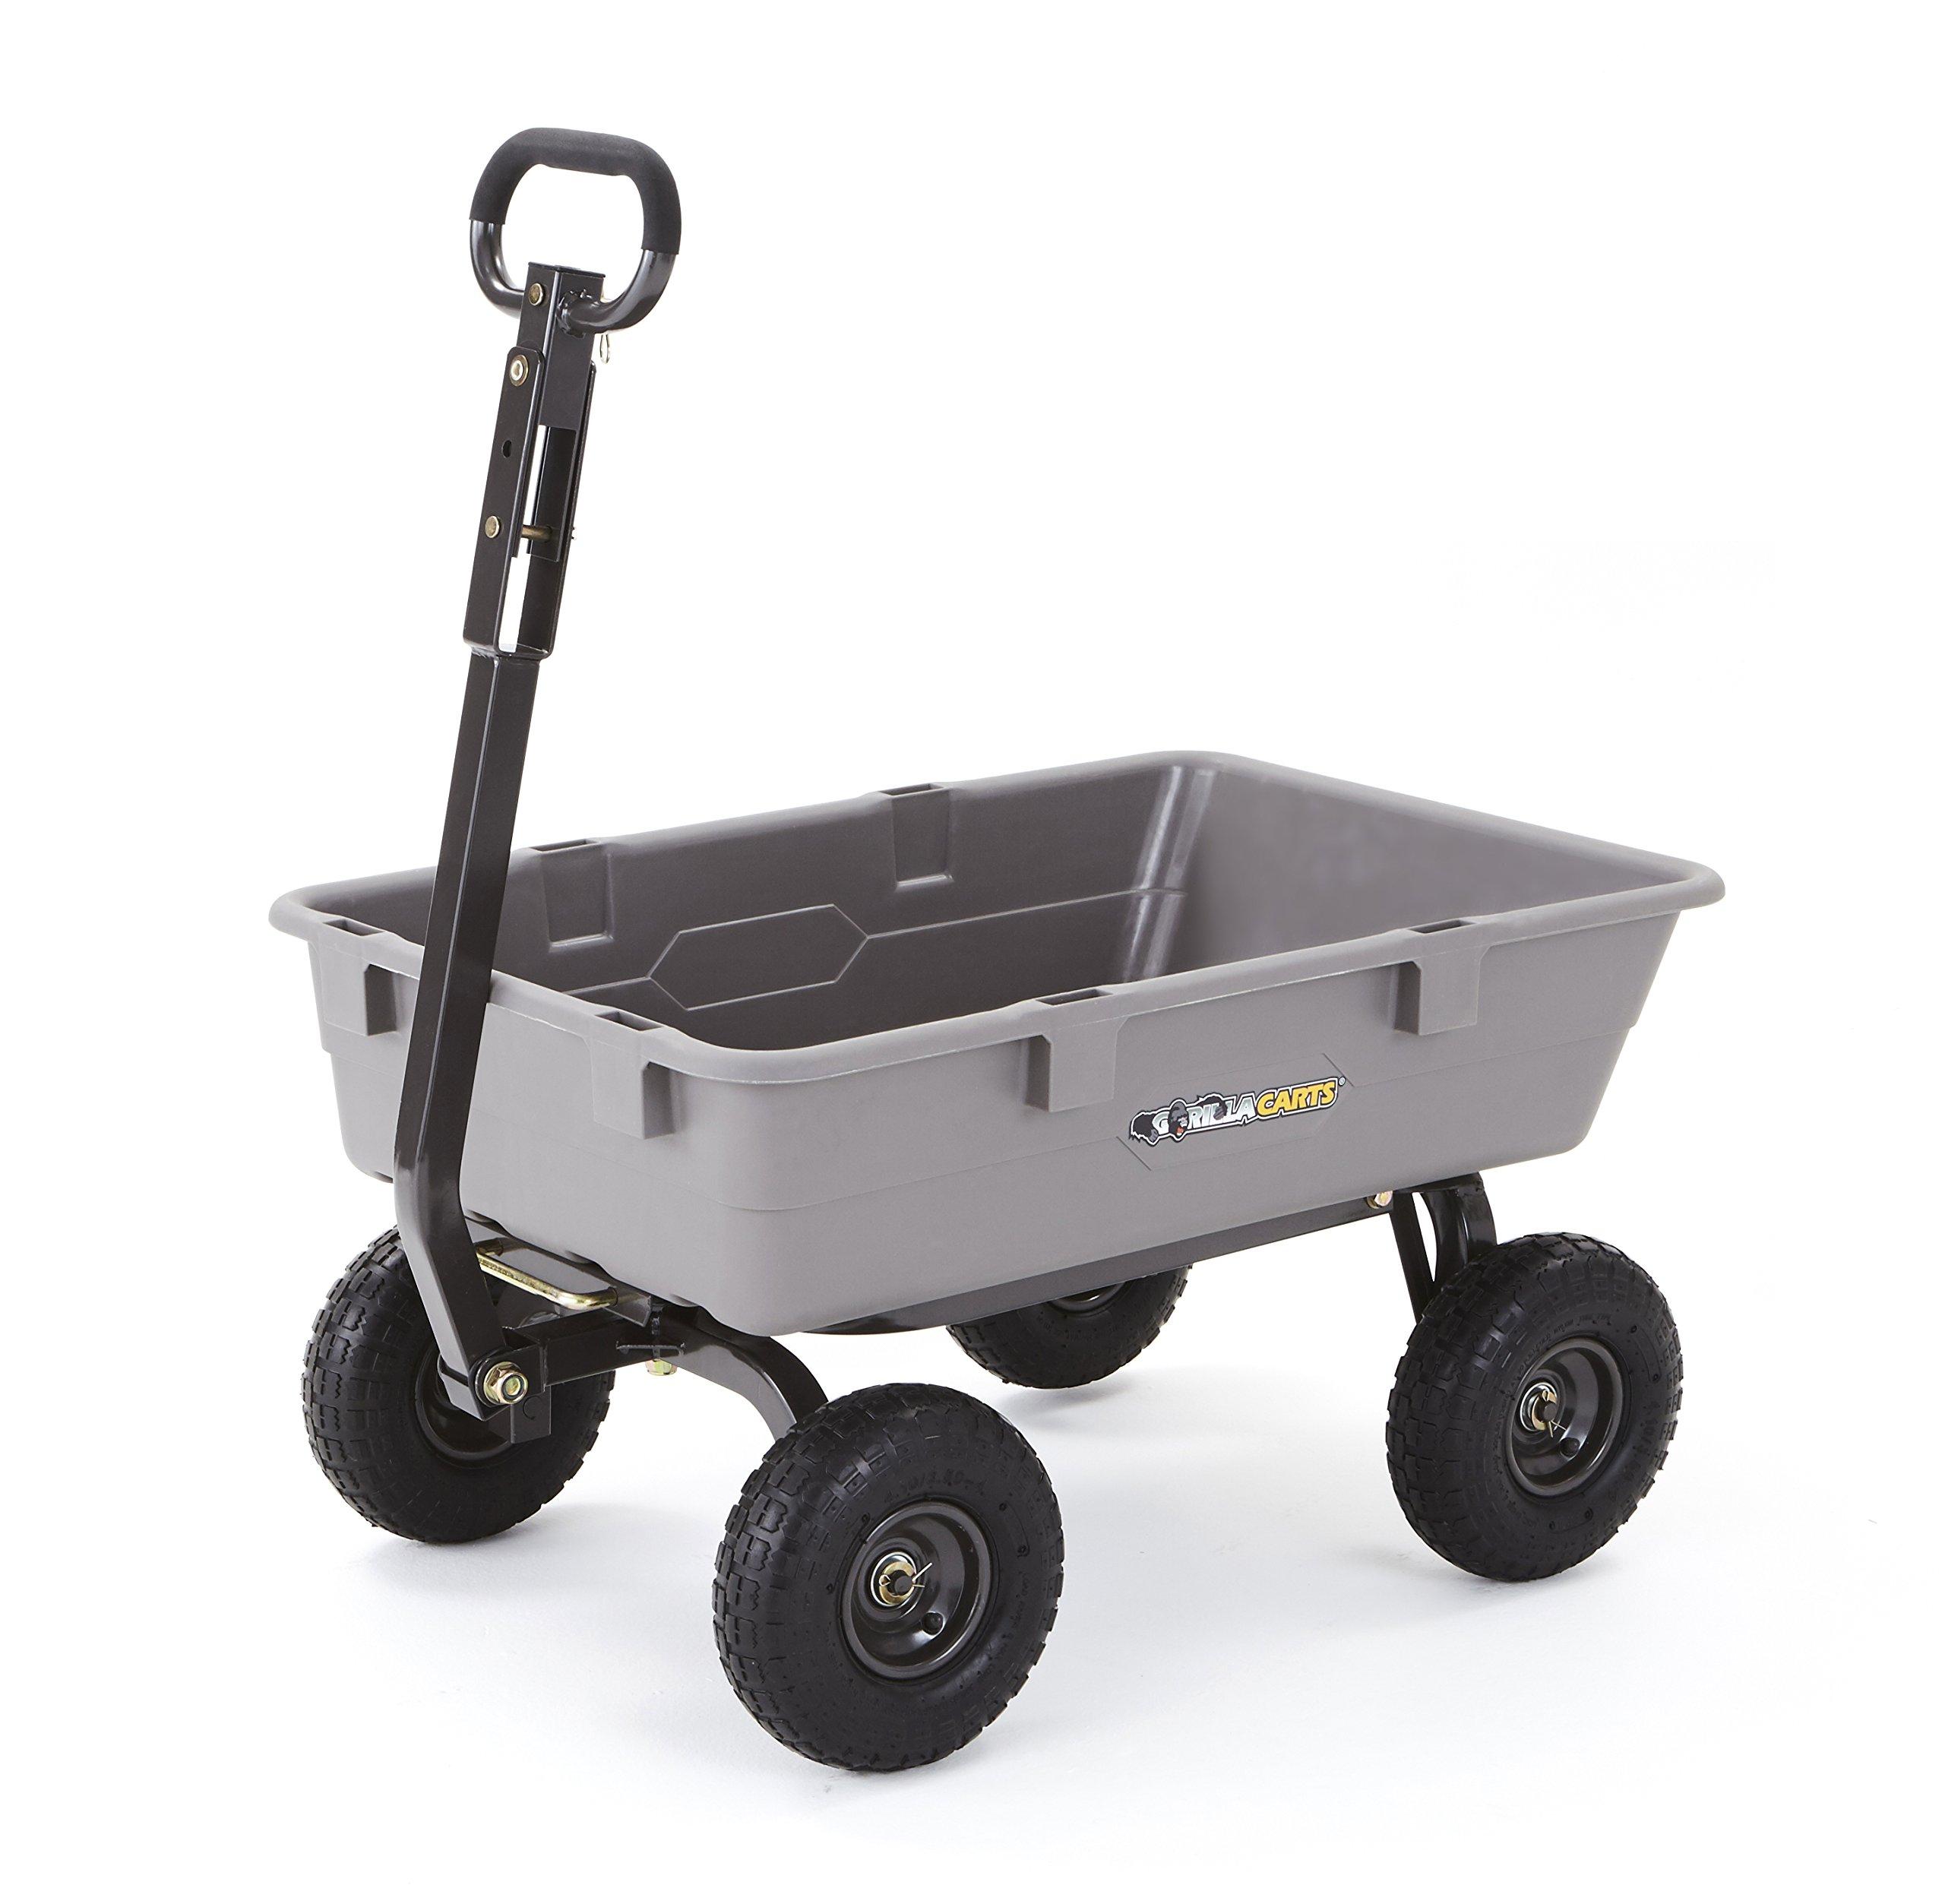 8afddb565d48 Cheap Atv Poly Dump Cart, find Atv Poly Dump Cart deals on line at ...